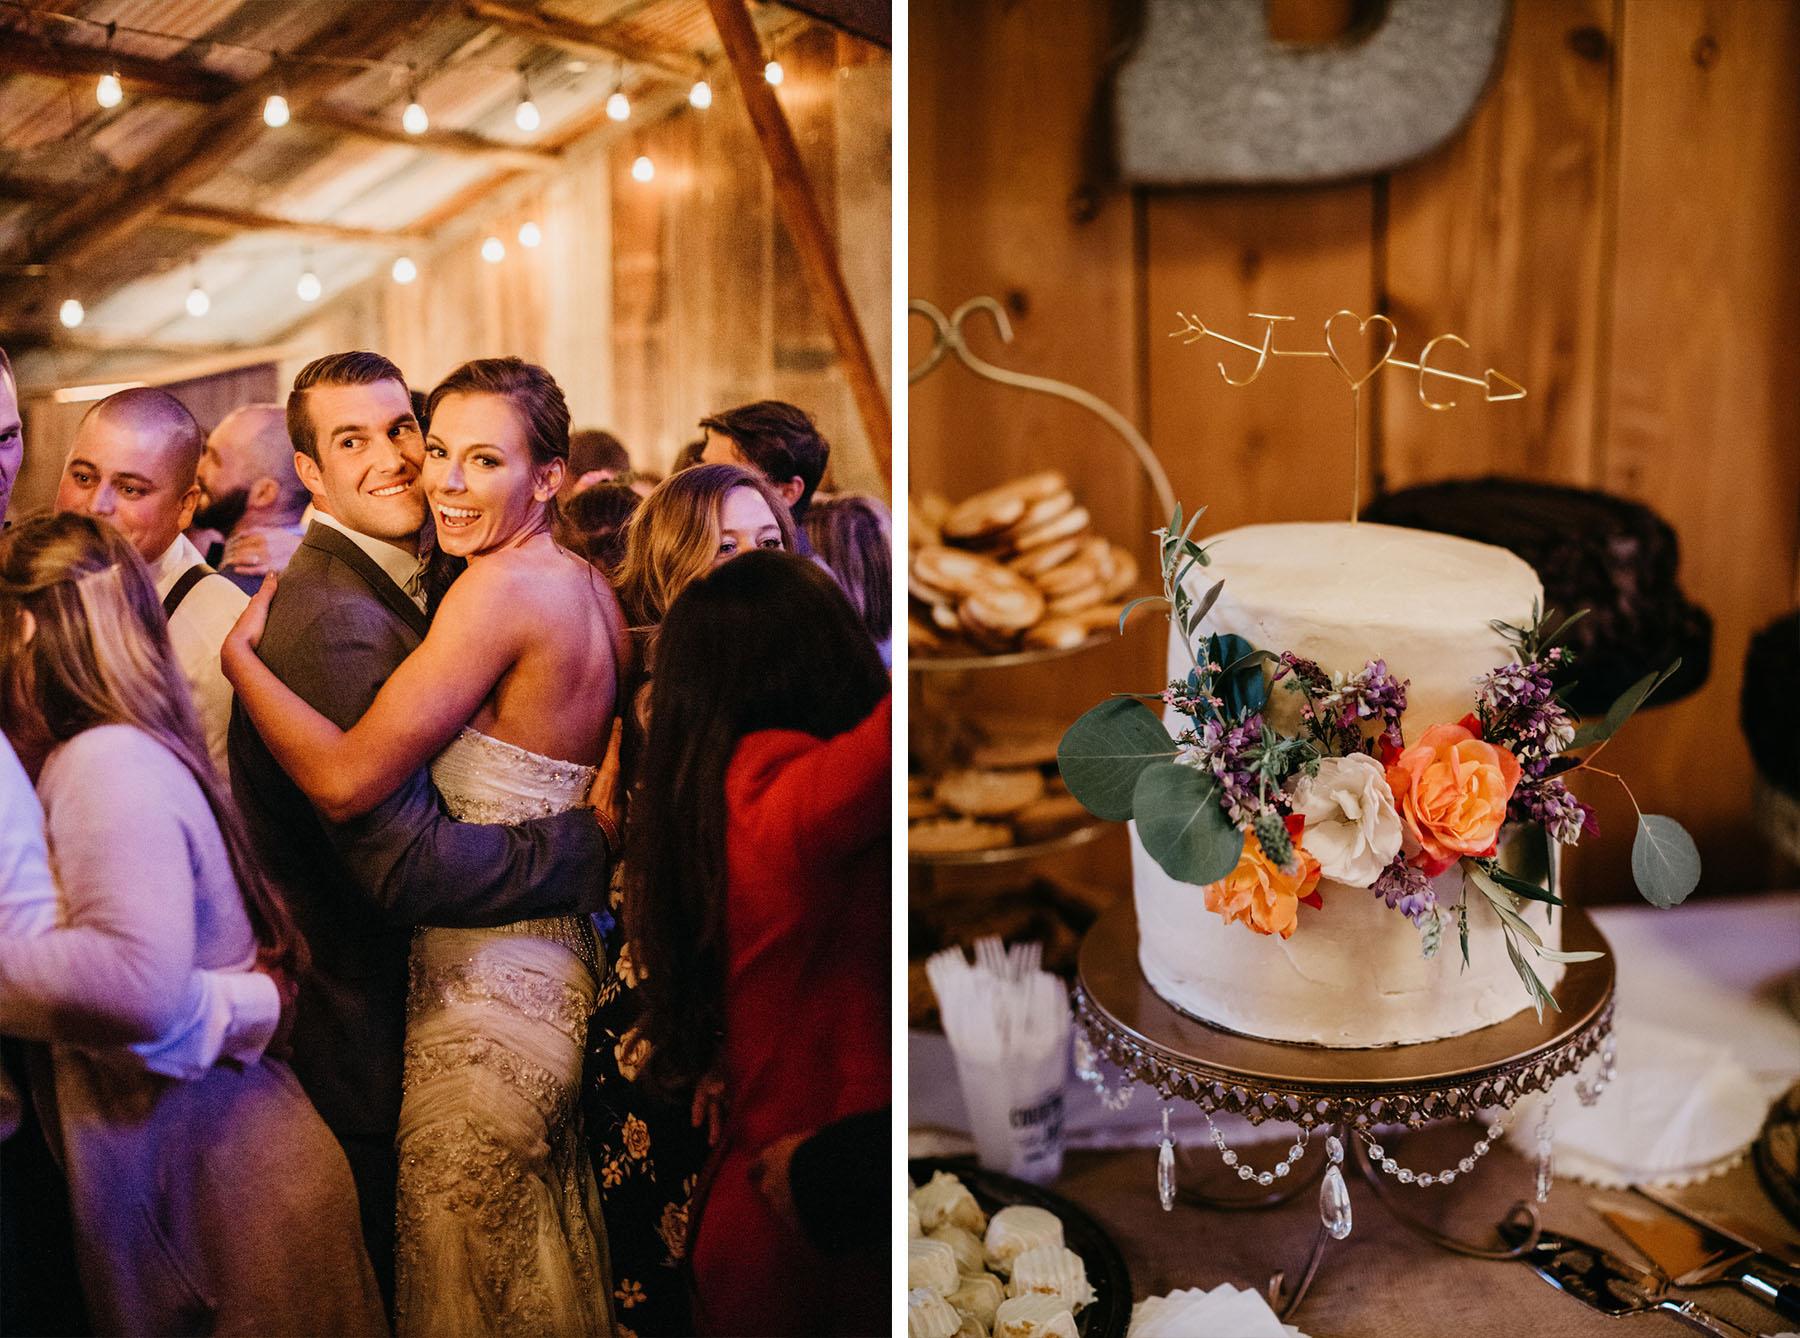 C+J-Grace-Maralyn-Estate-wedding-7.jpg